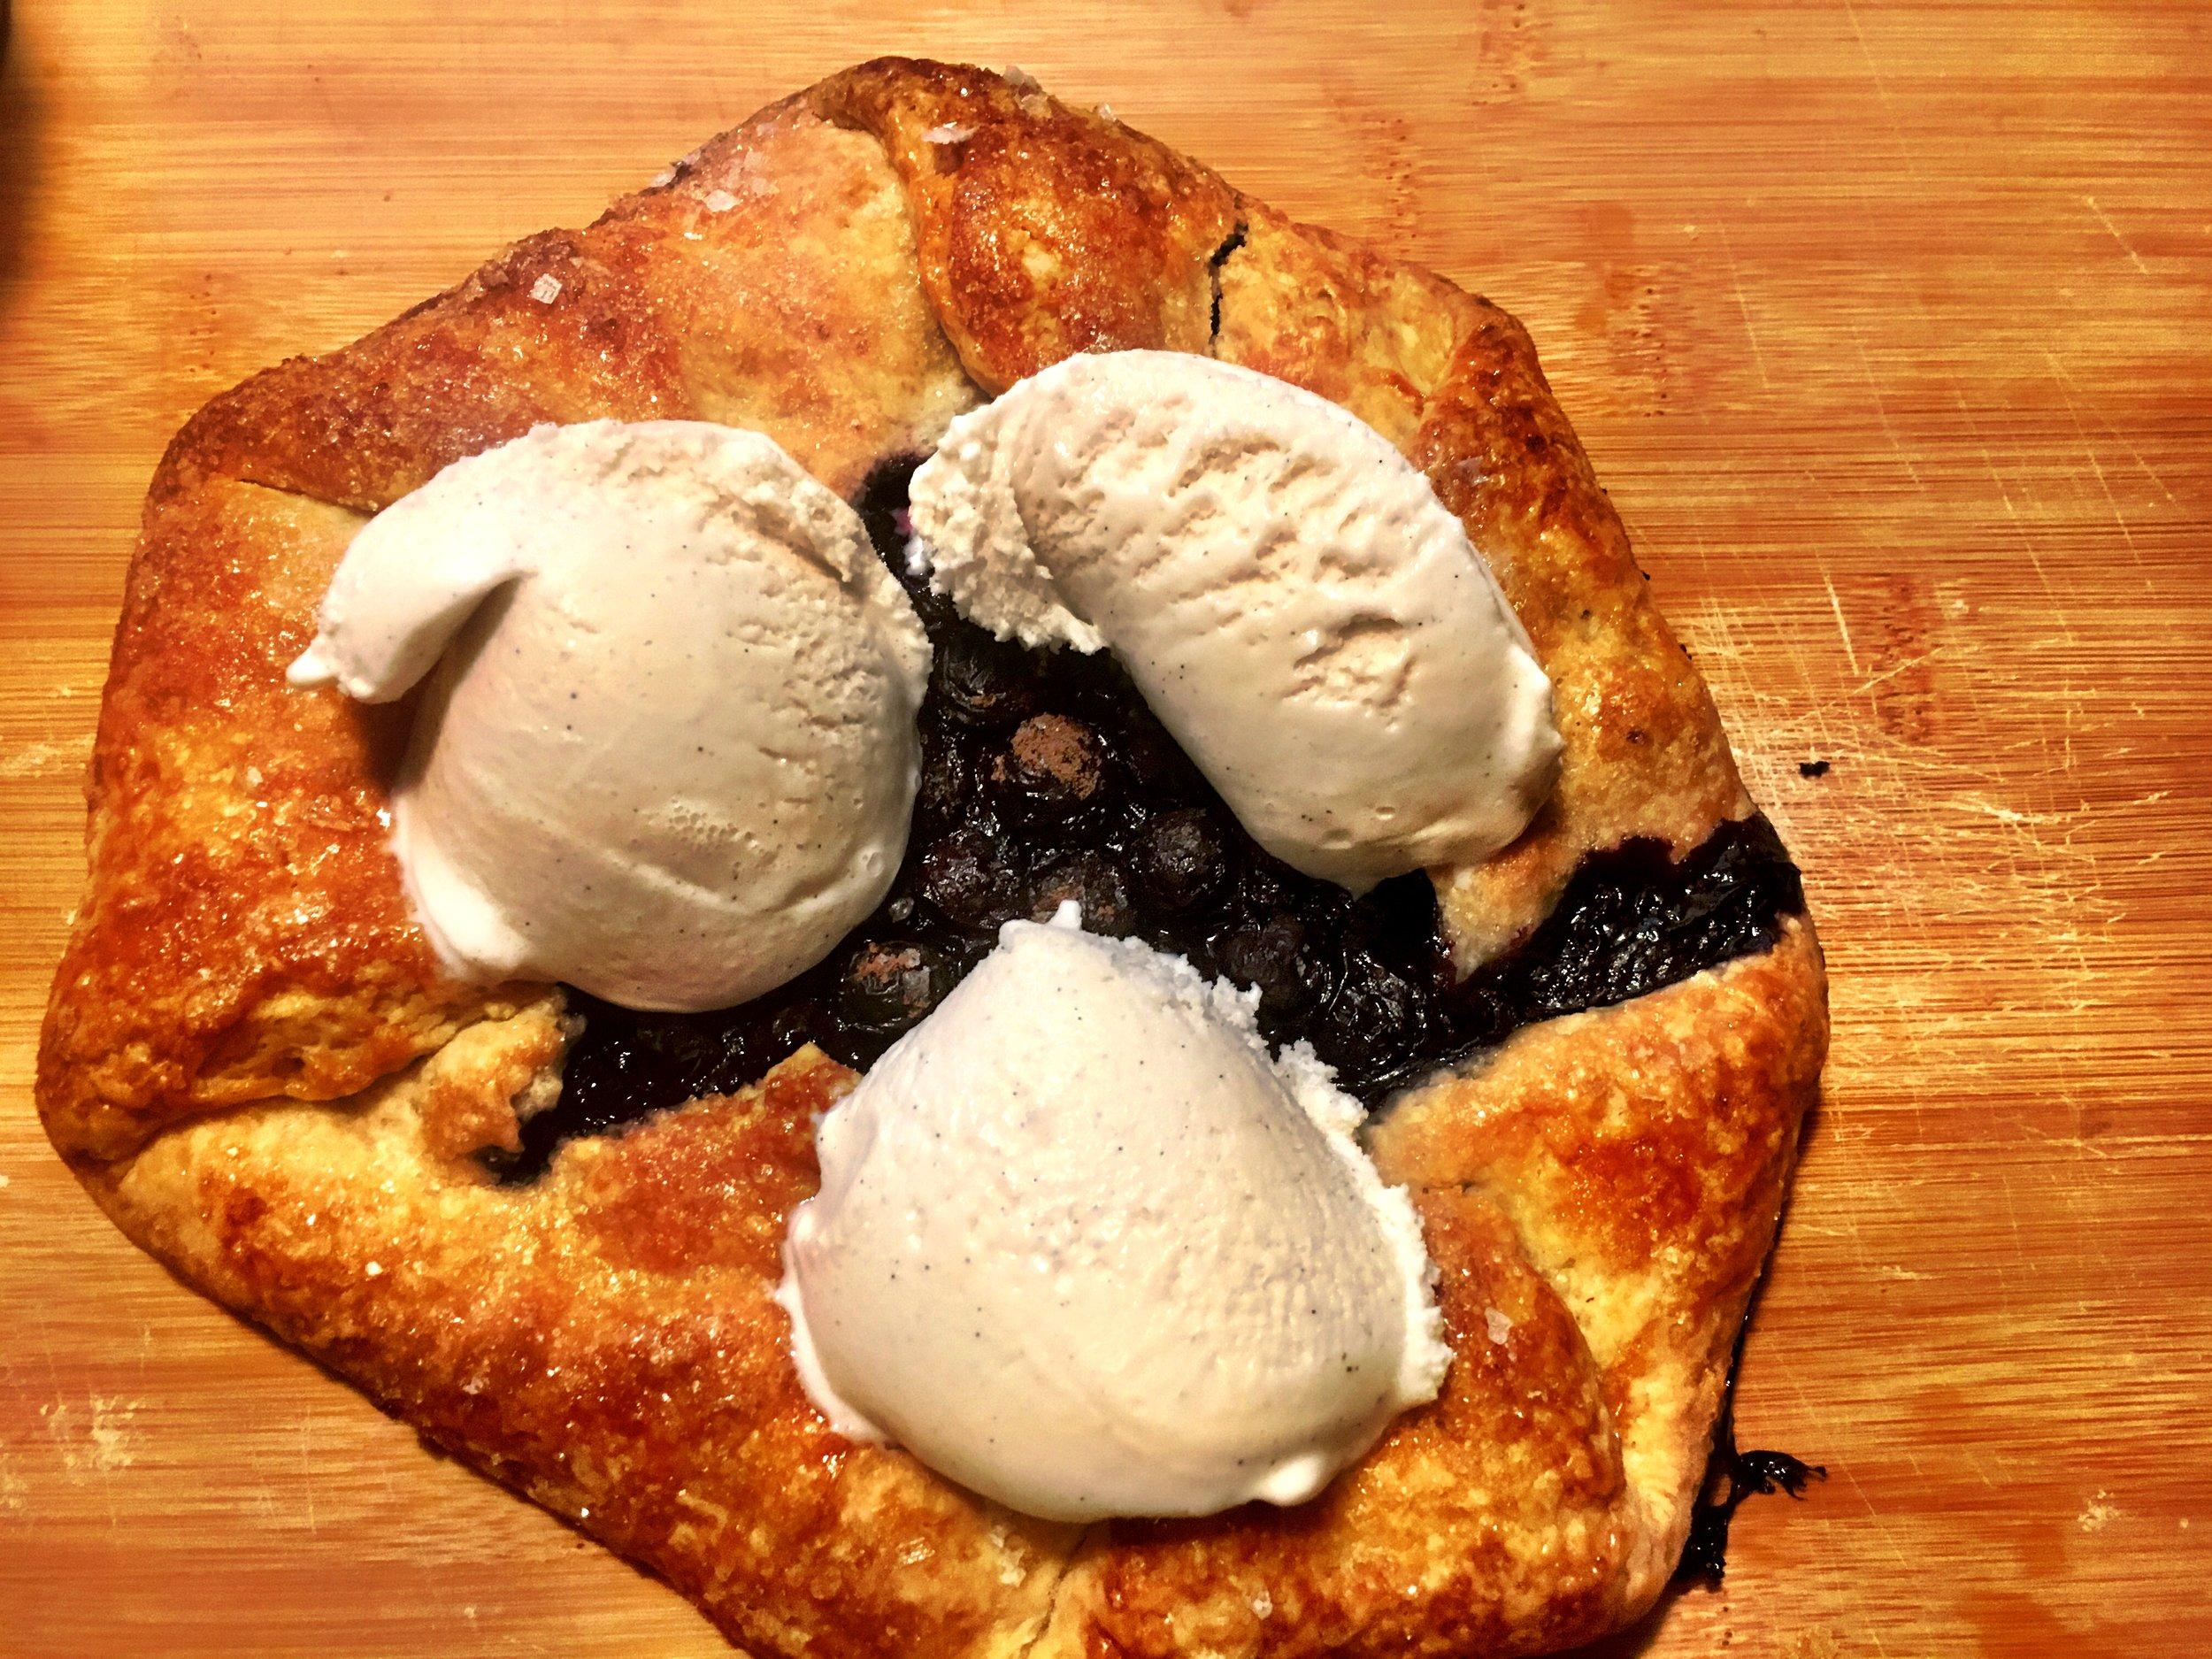 Crostata - Final with Ice Cream.jpg